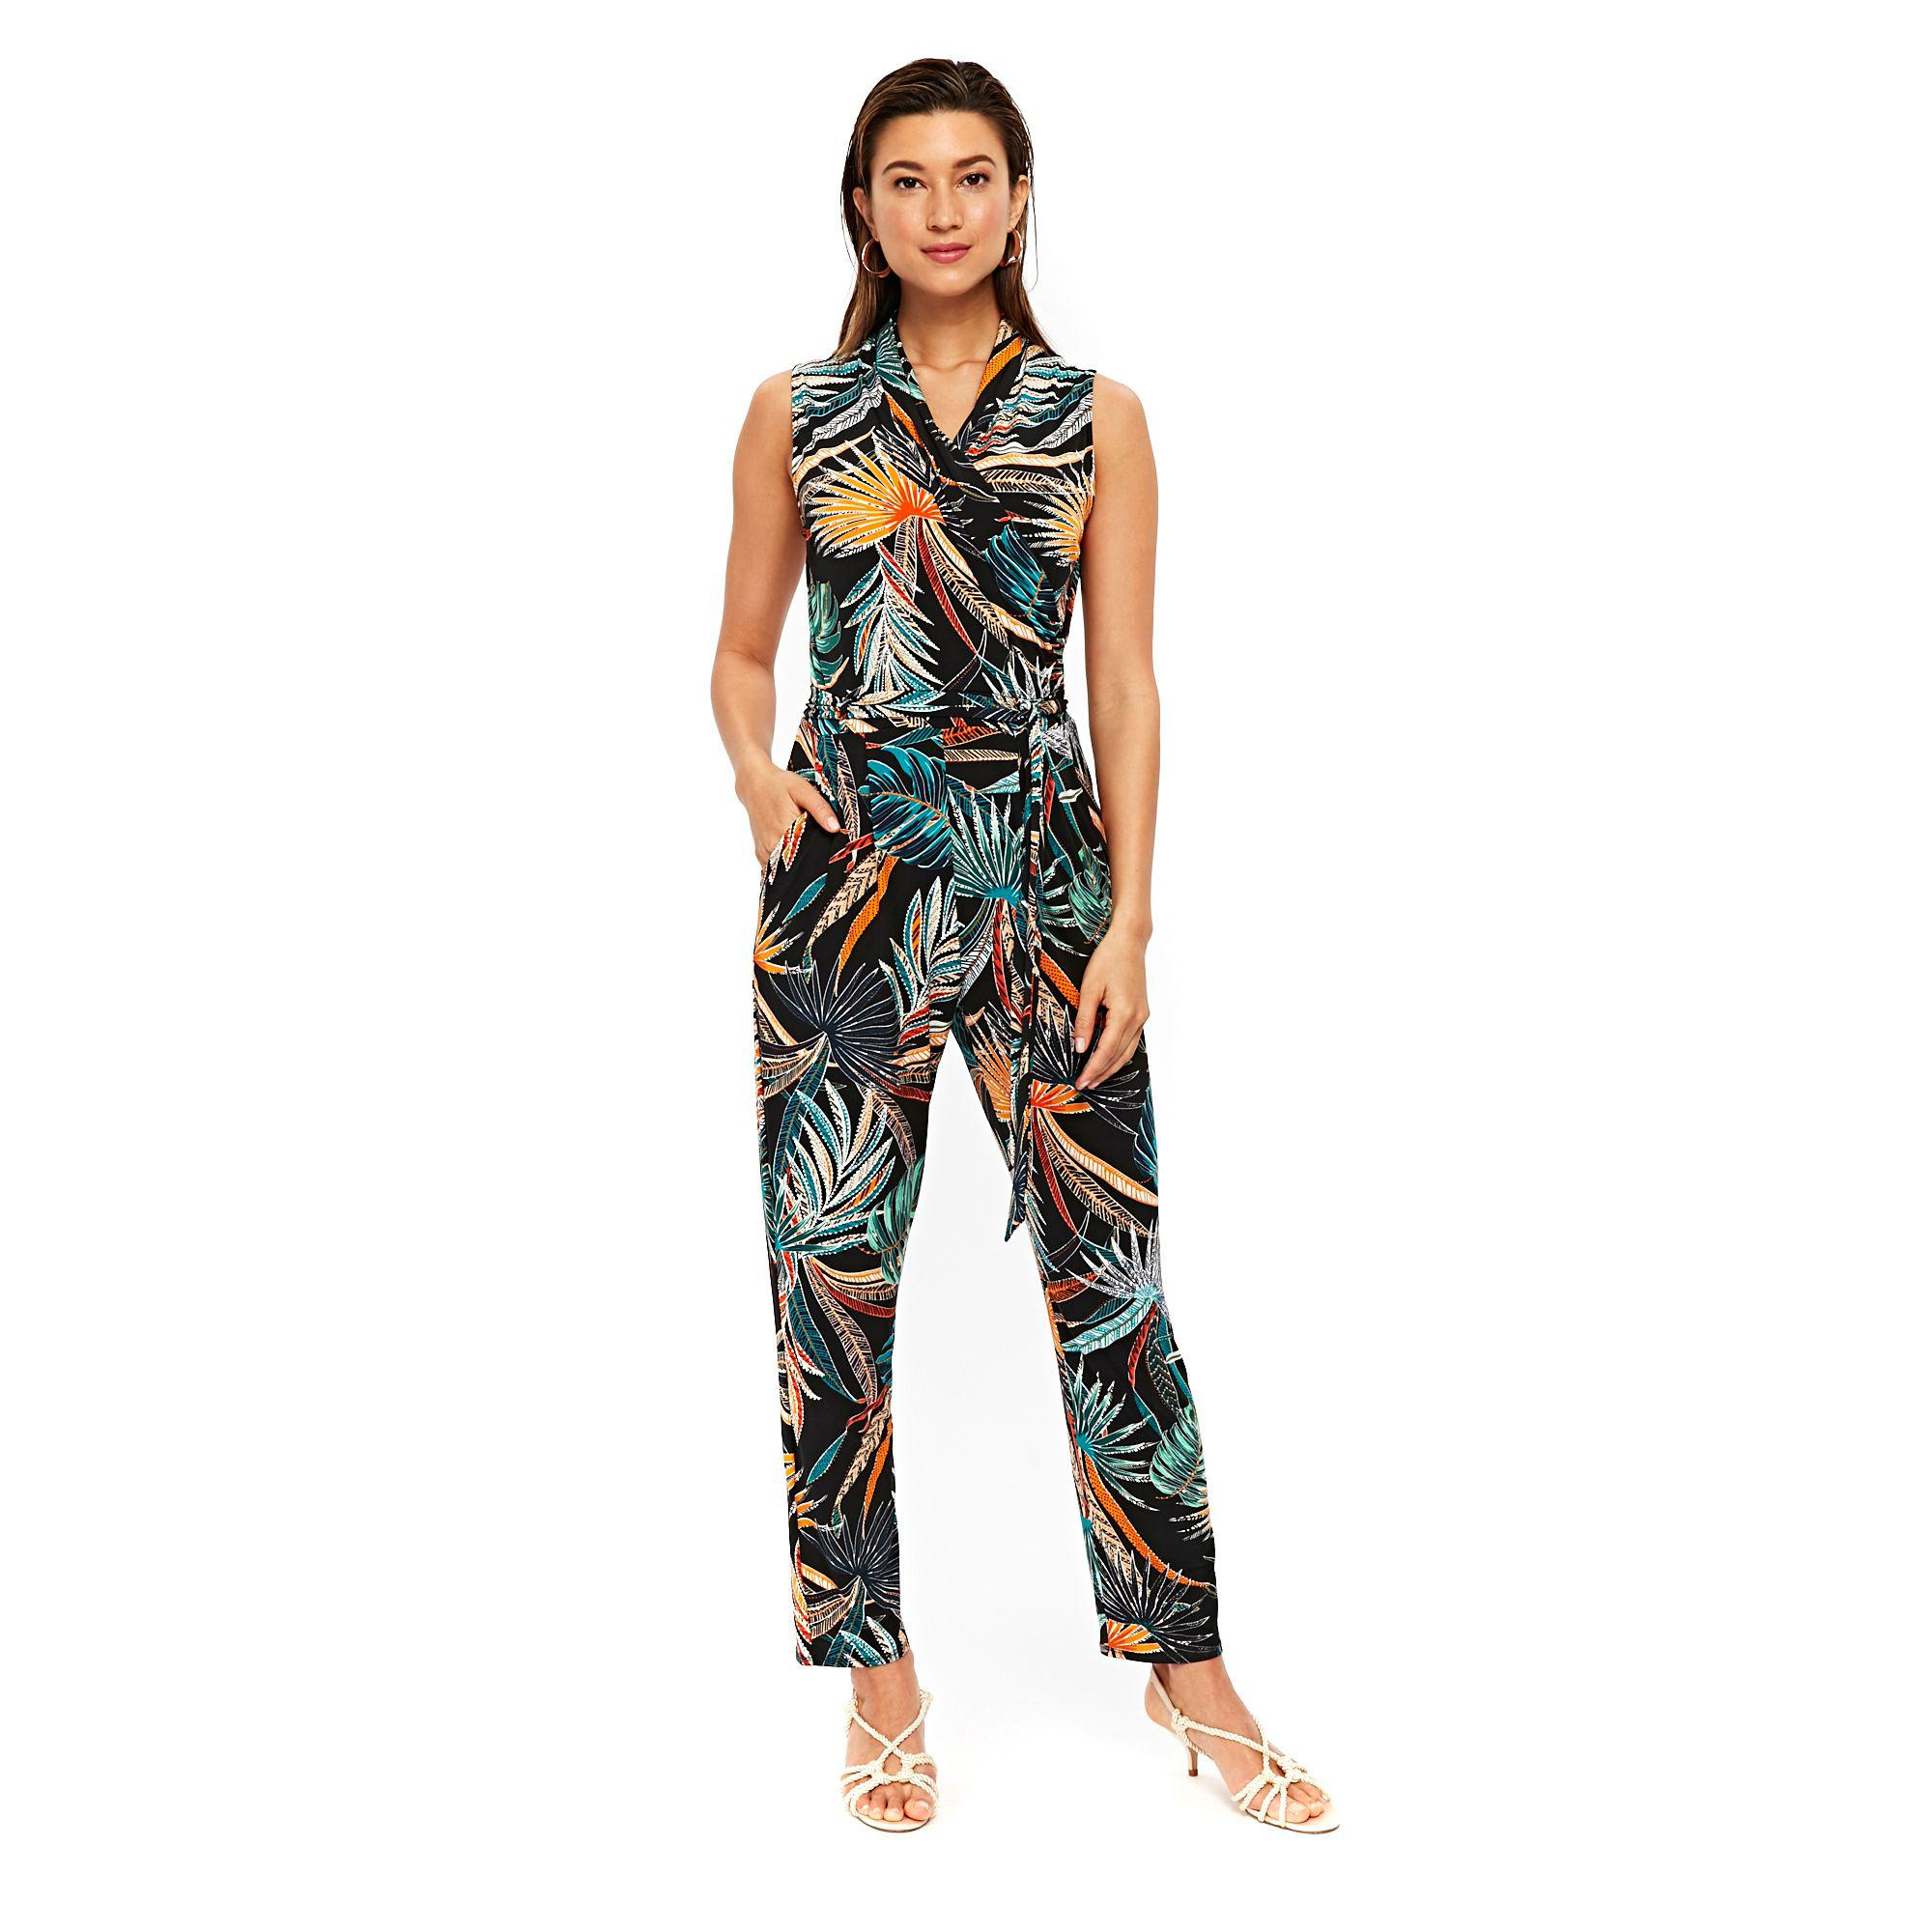 Wallis Black Palm Print Jumpsuit in Black